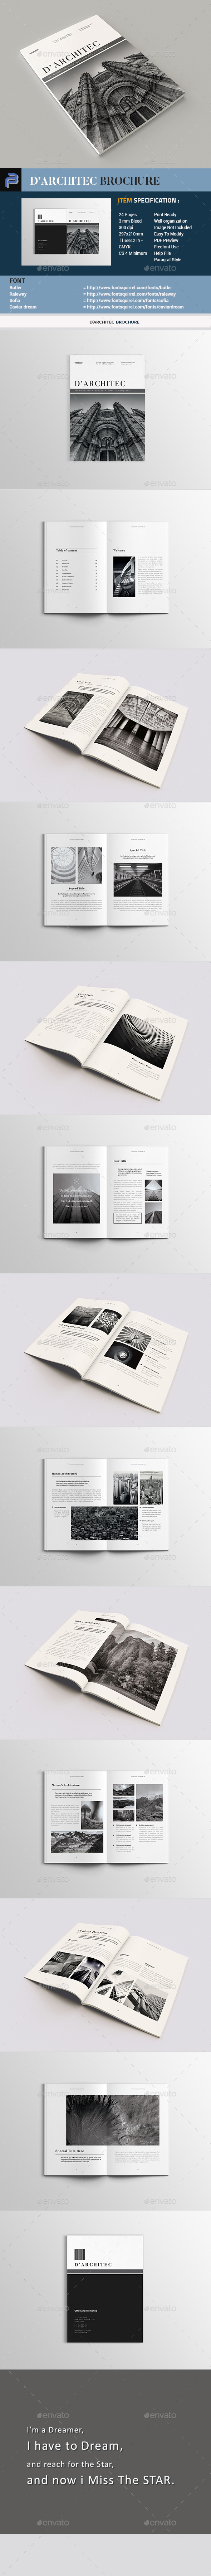 Architecture Brochure - Portfolio Brochures